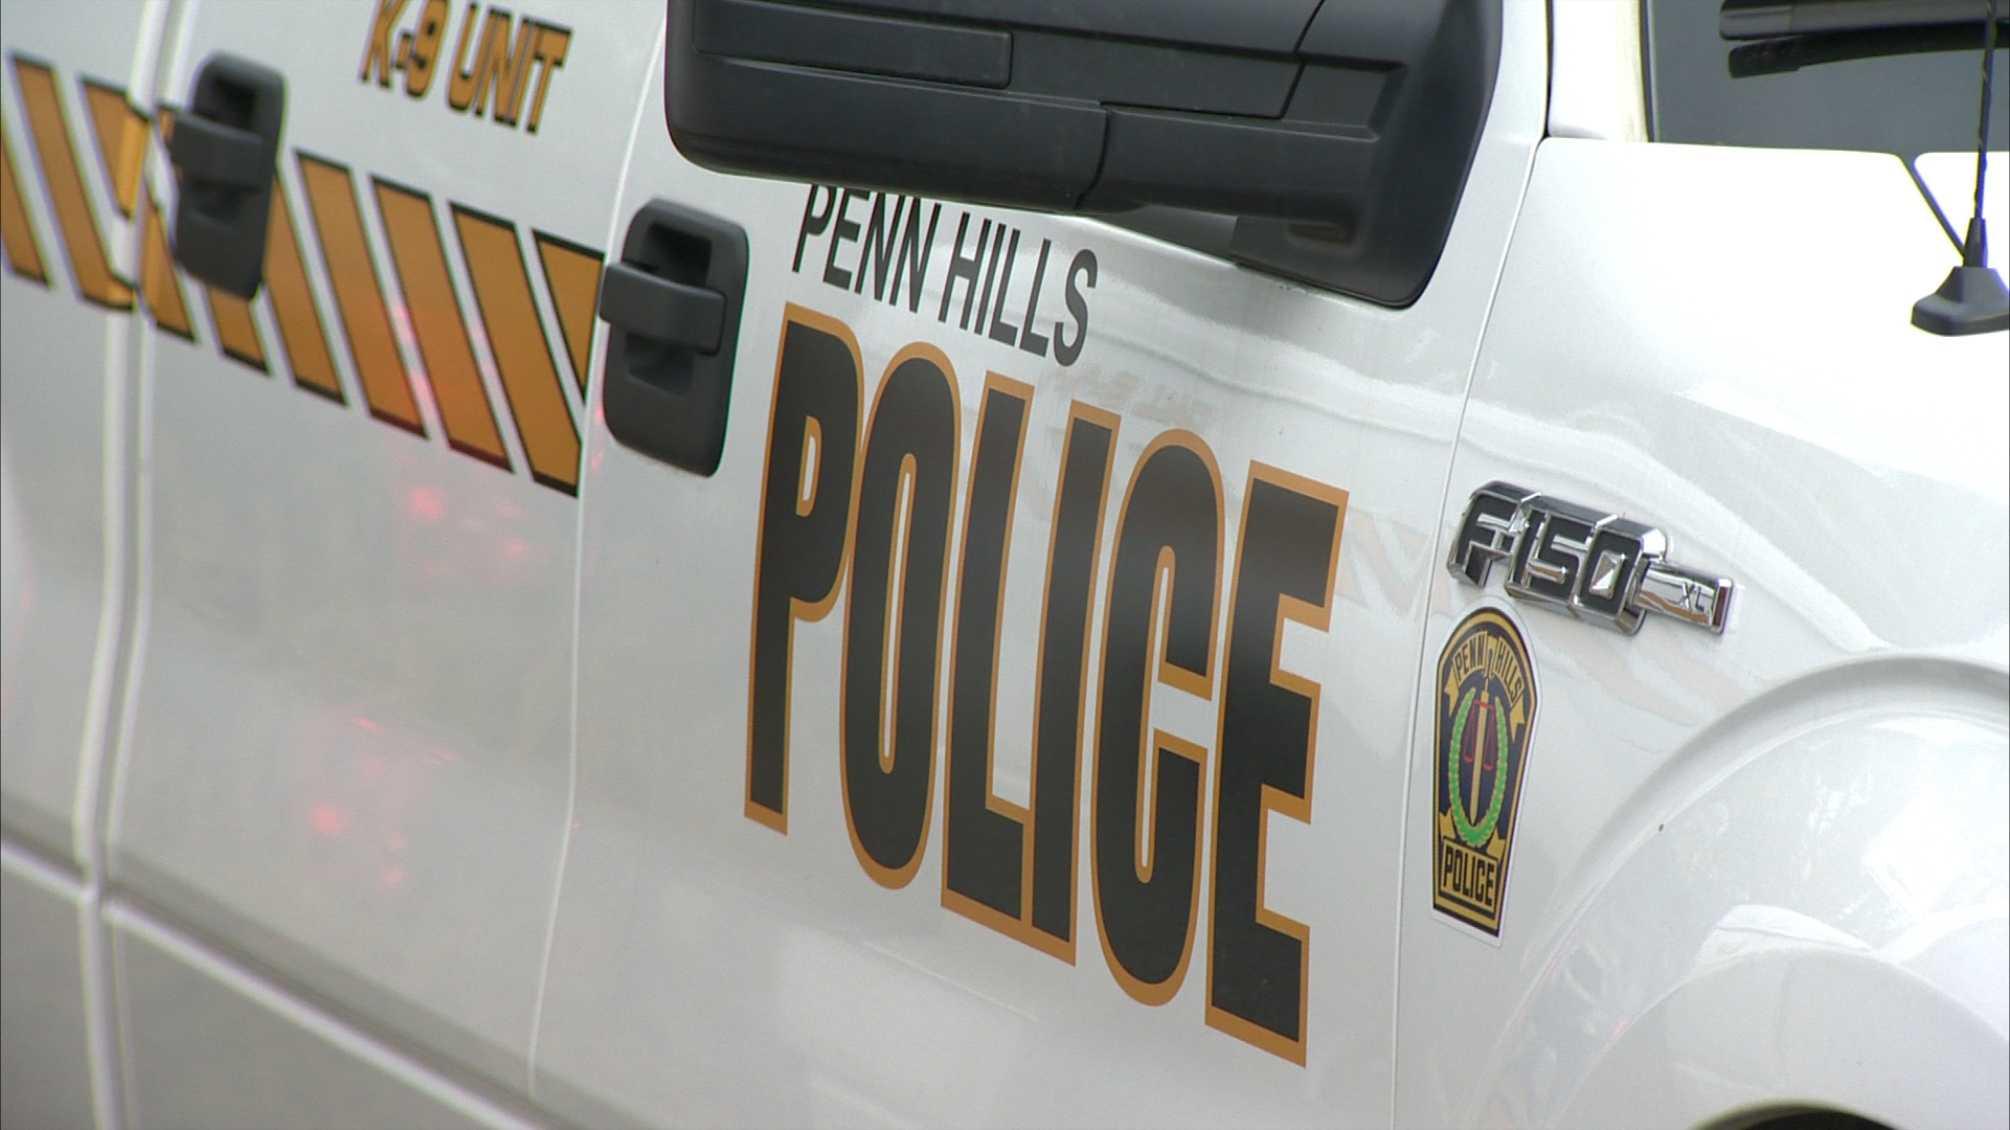 Penn Hills police